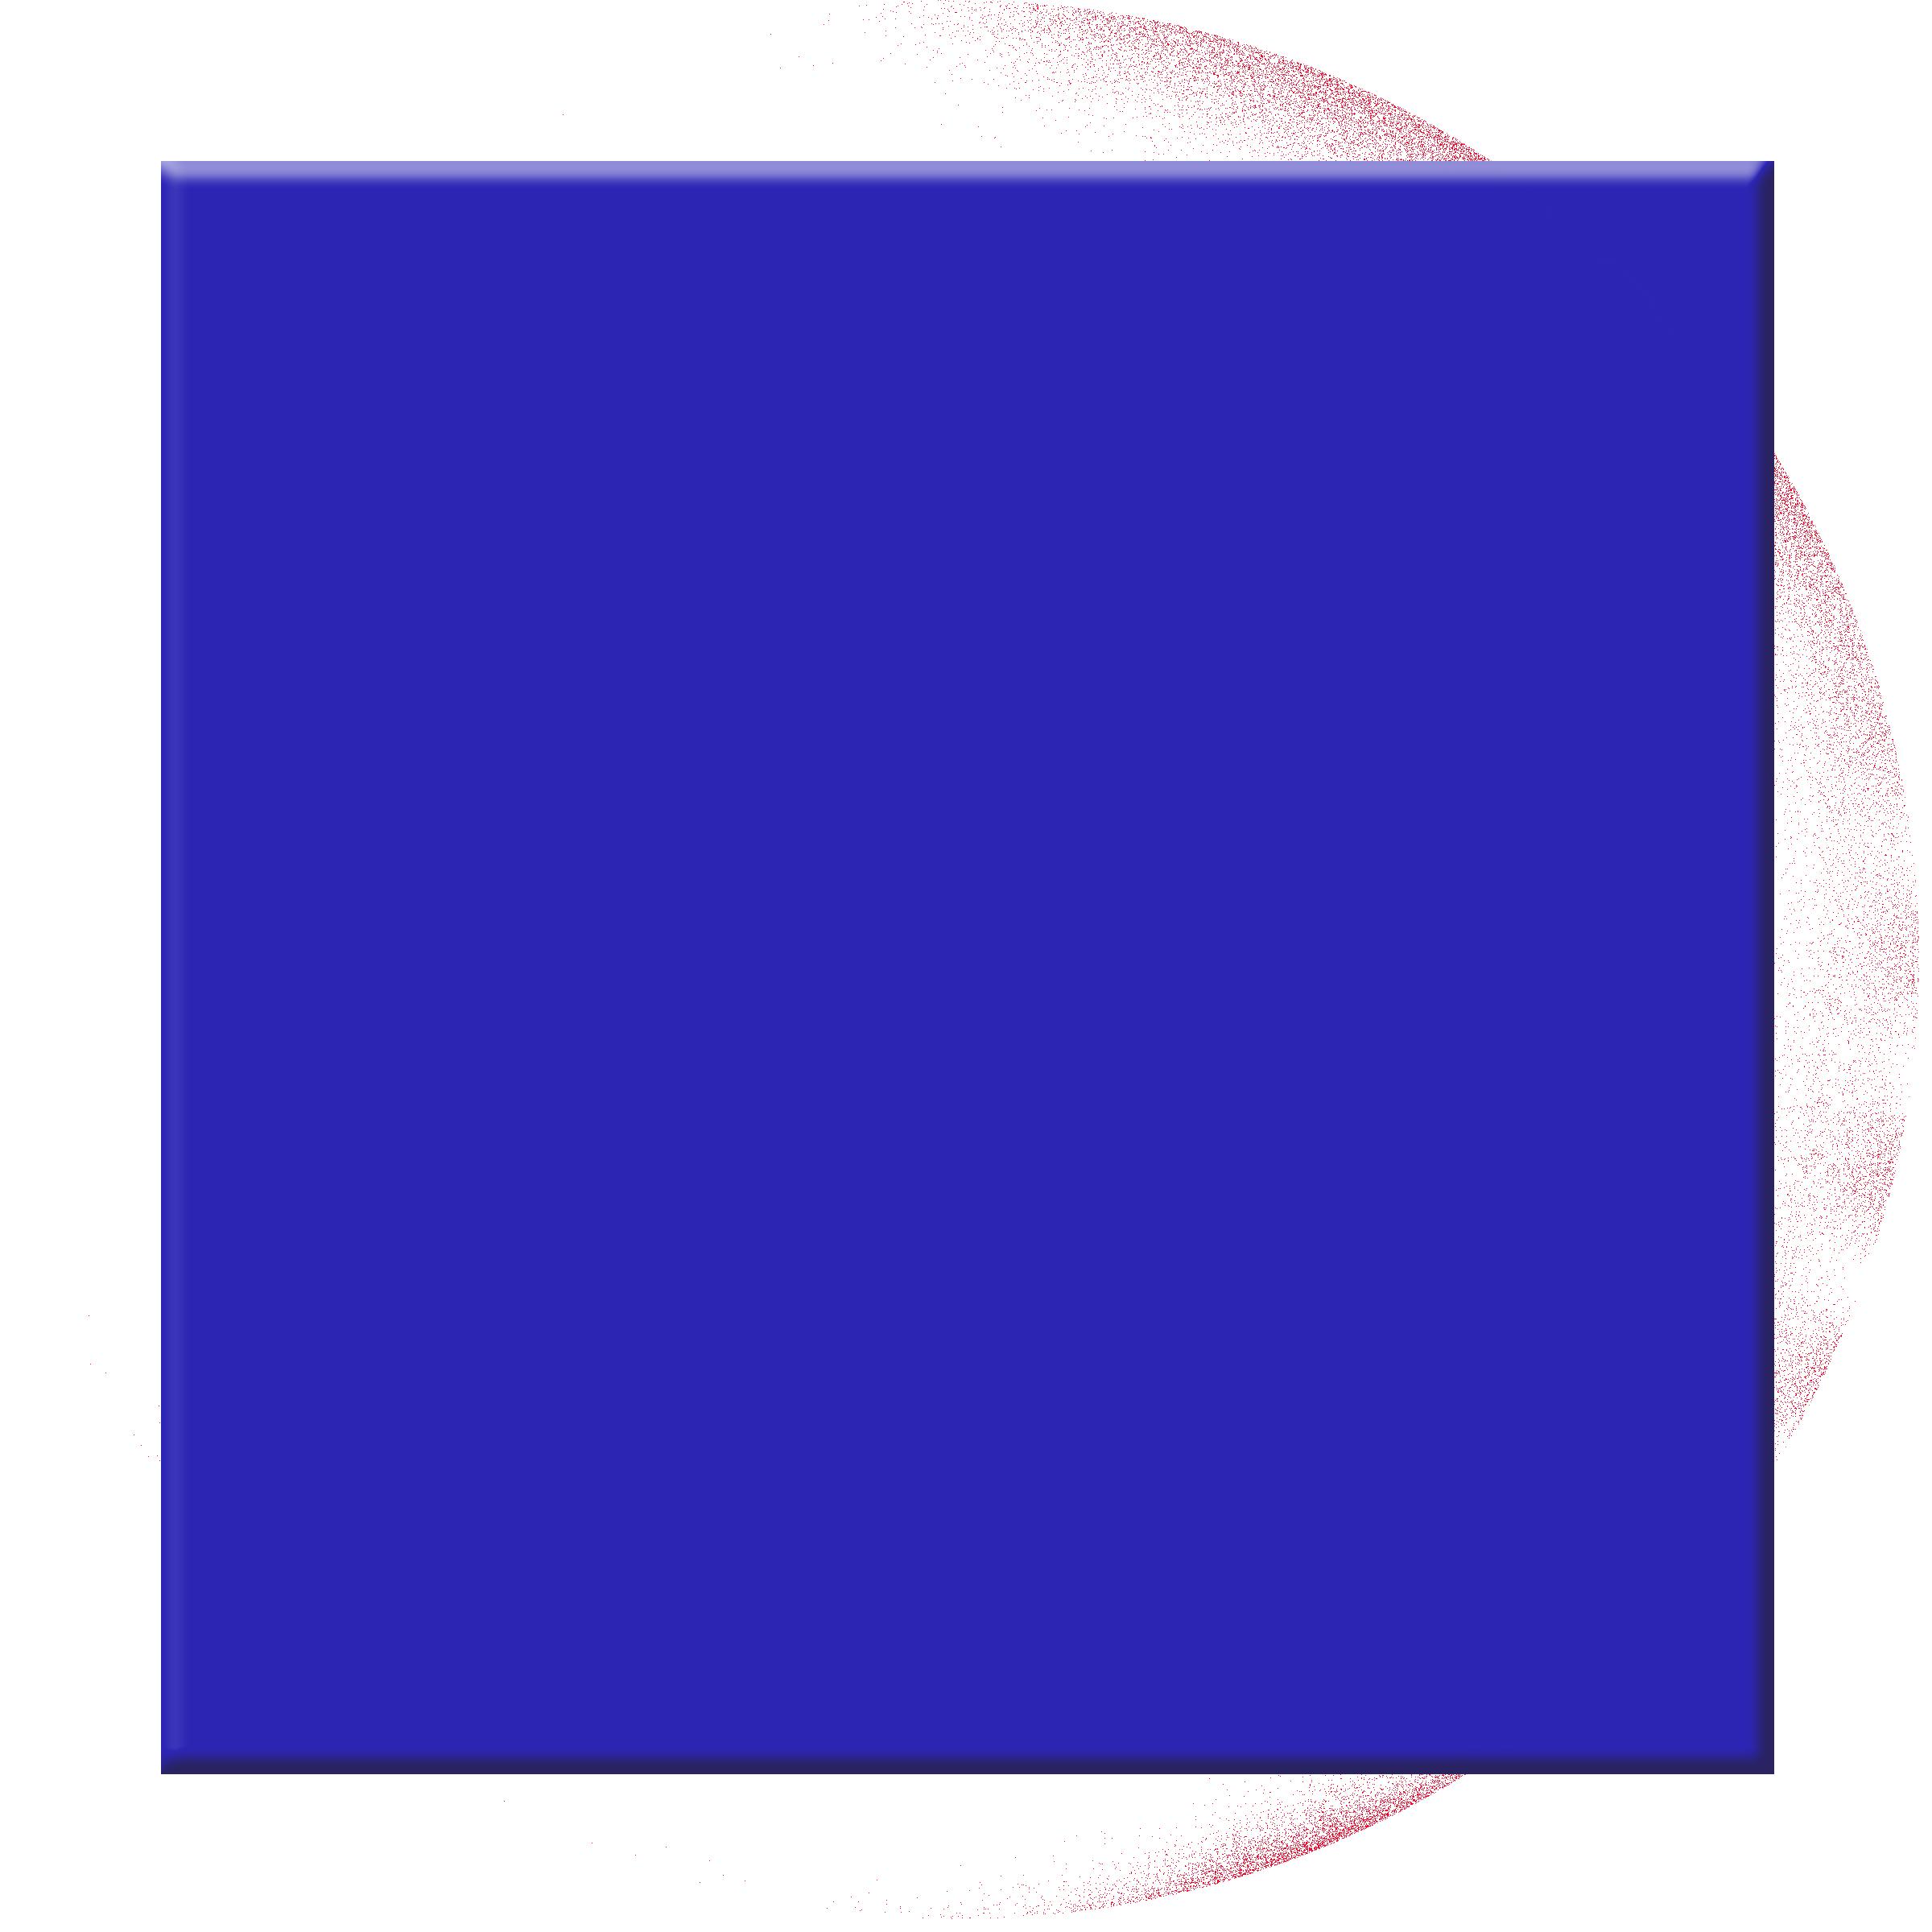 Blue Square   Free Ima...